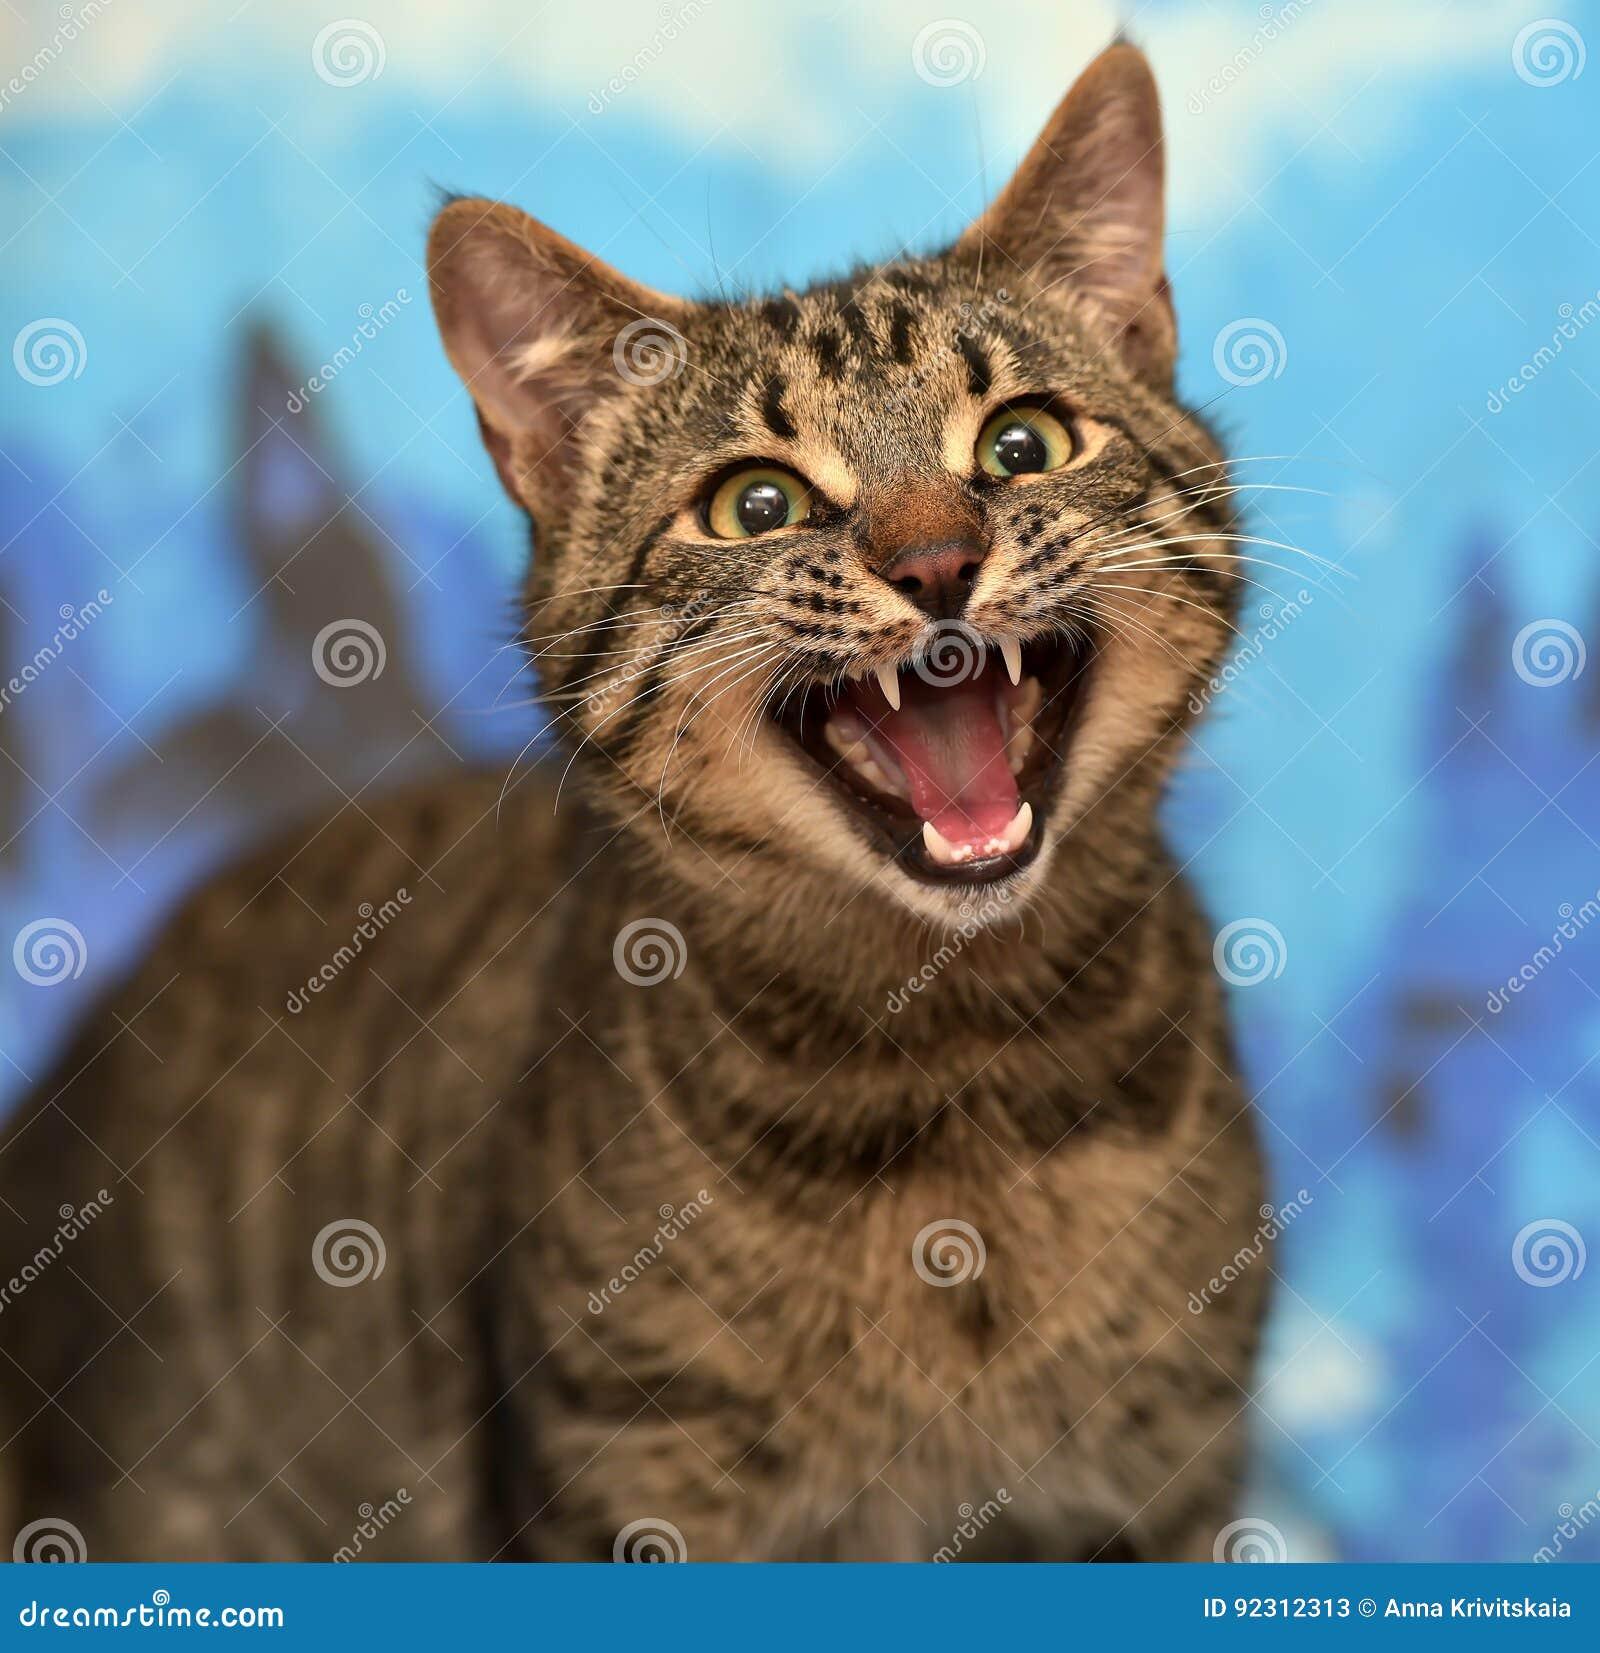 Tabby cat meows